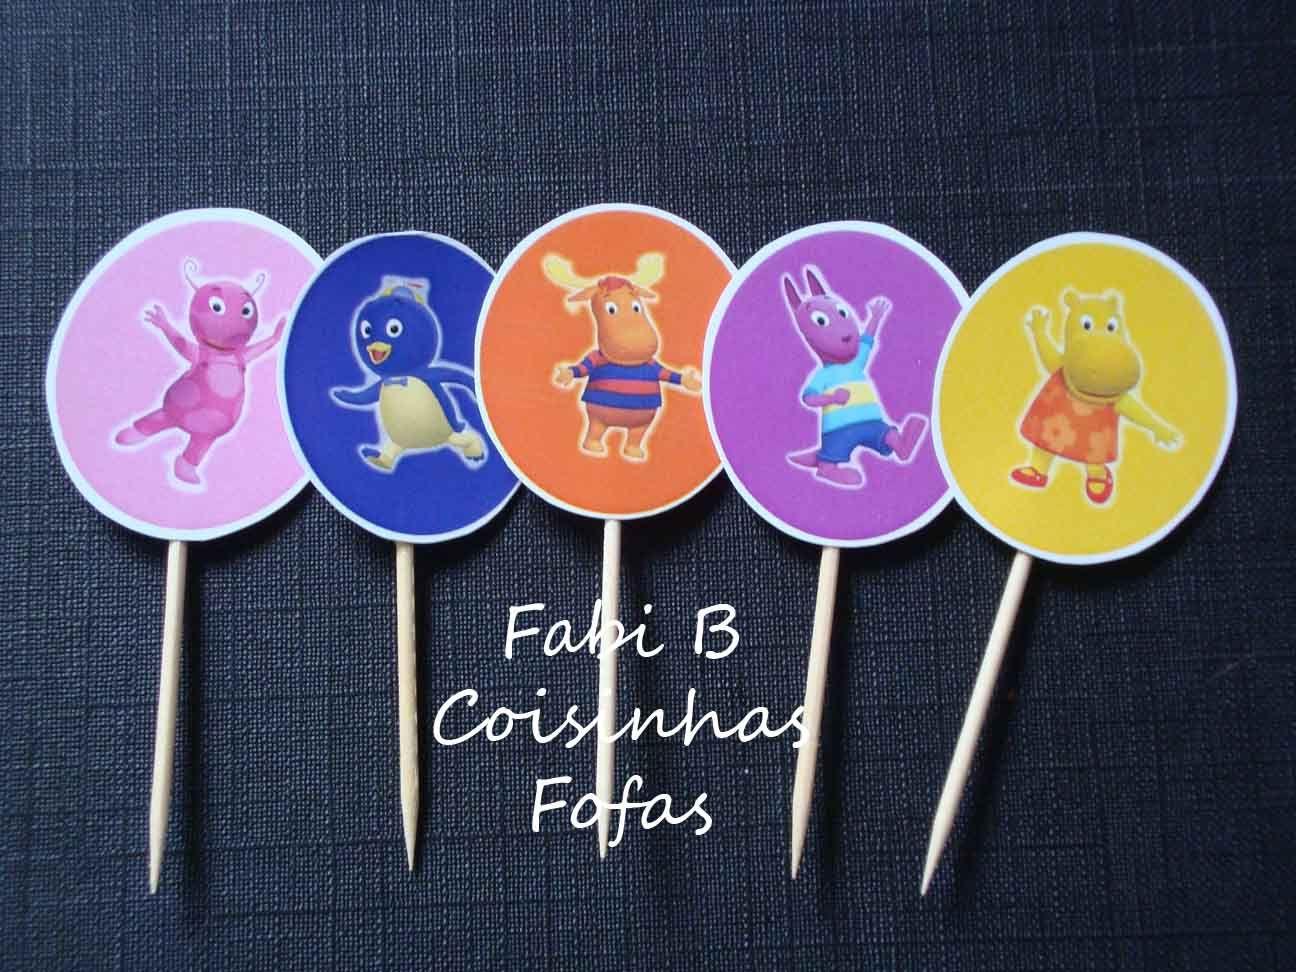 Backyardigans cupcake topper | fabi_b: Convite Backyardigans + Toppers de Cupcake Backyardigans